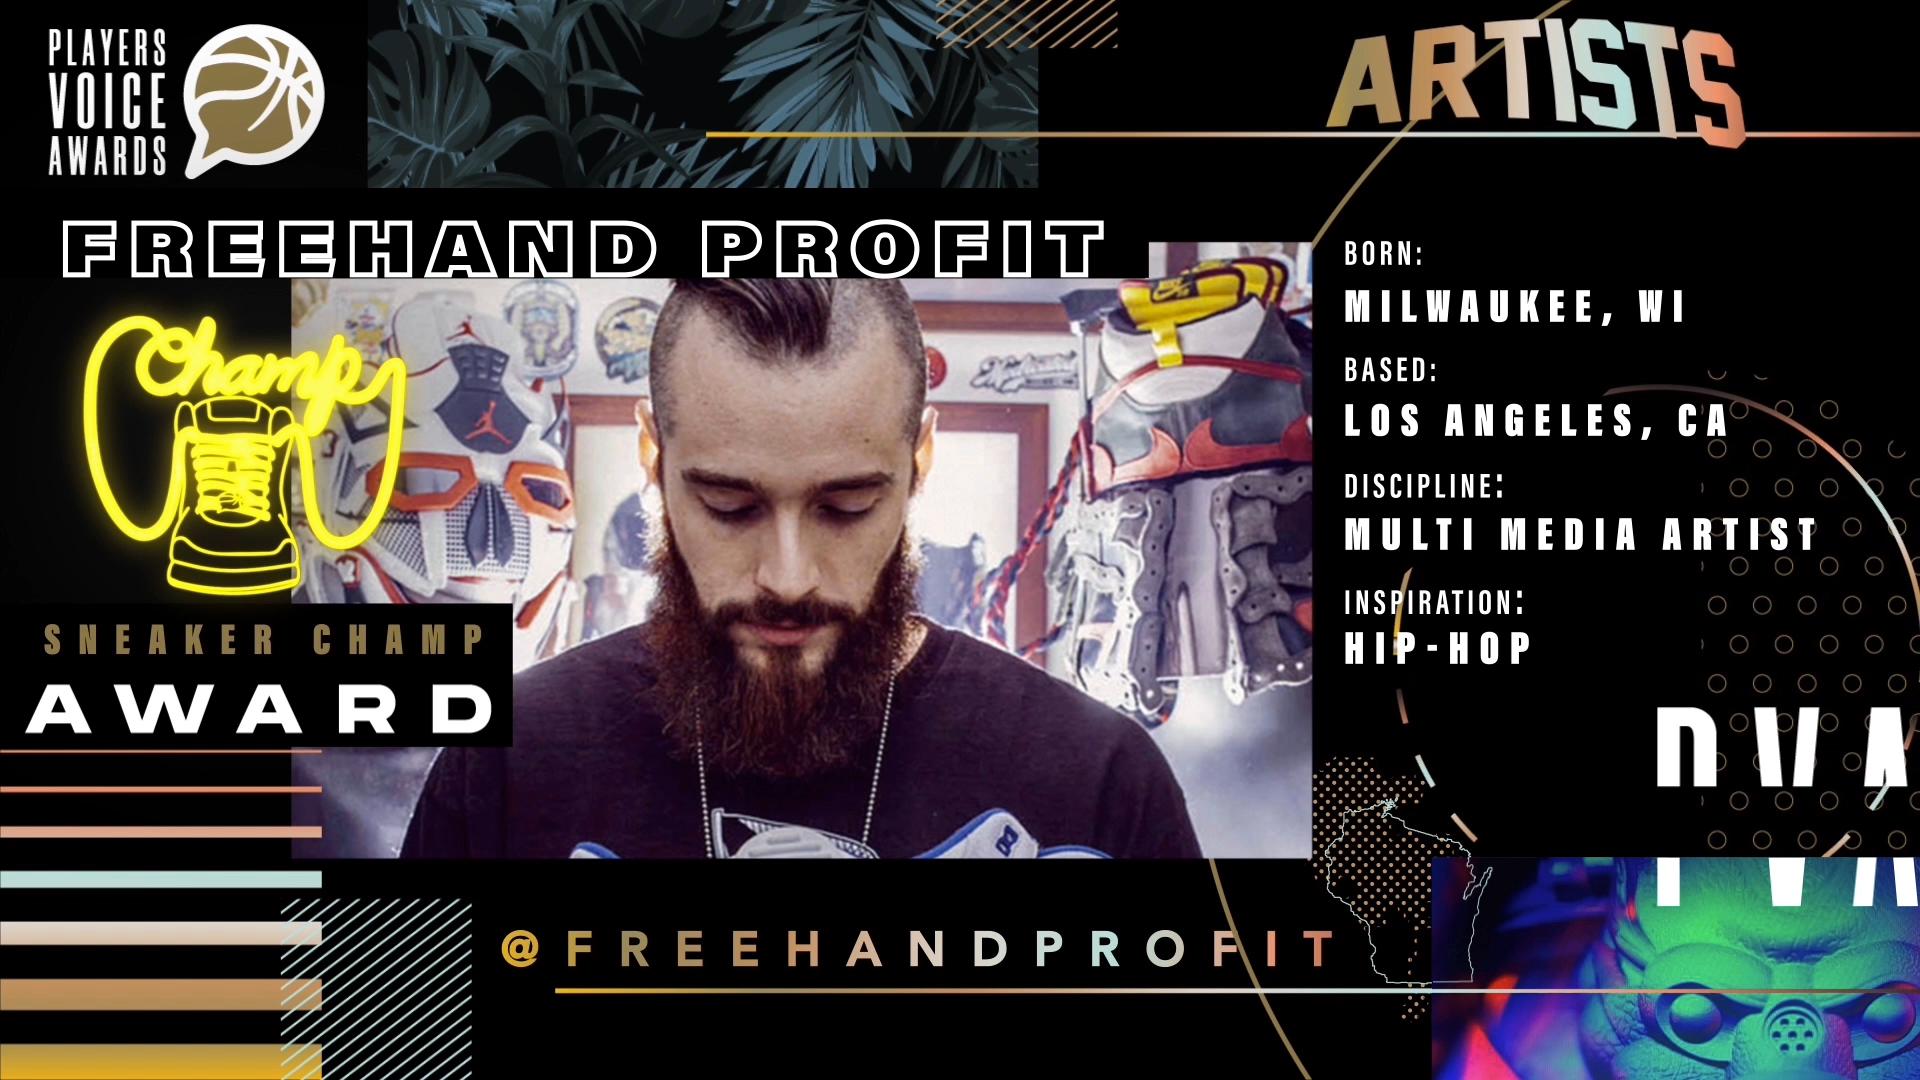 Free Hand Profit